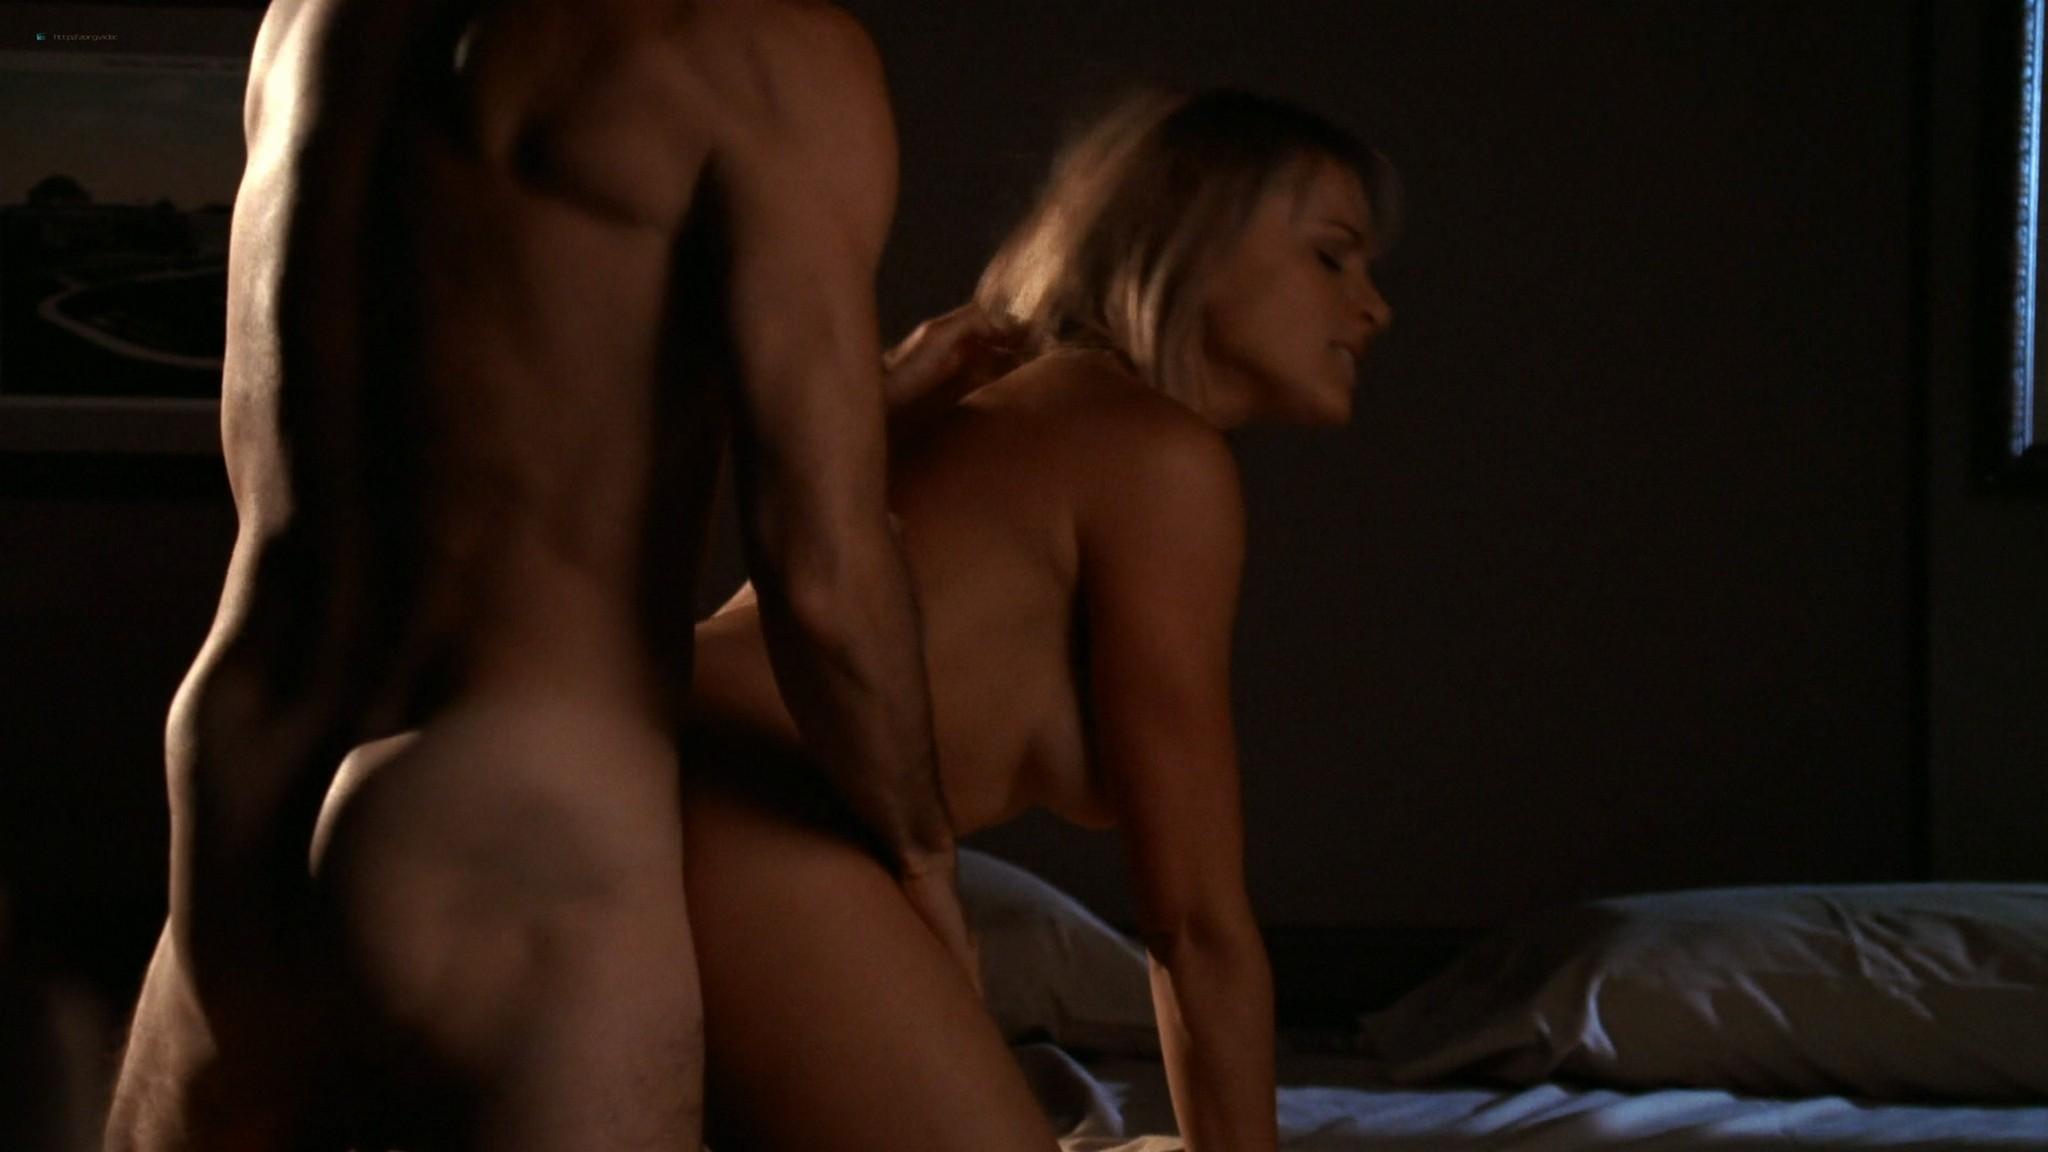 Hilary swank hot jennifer aspen, leslie danon nude